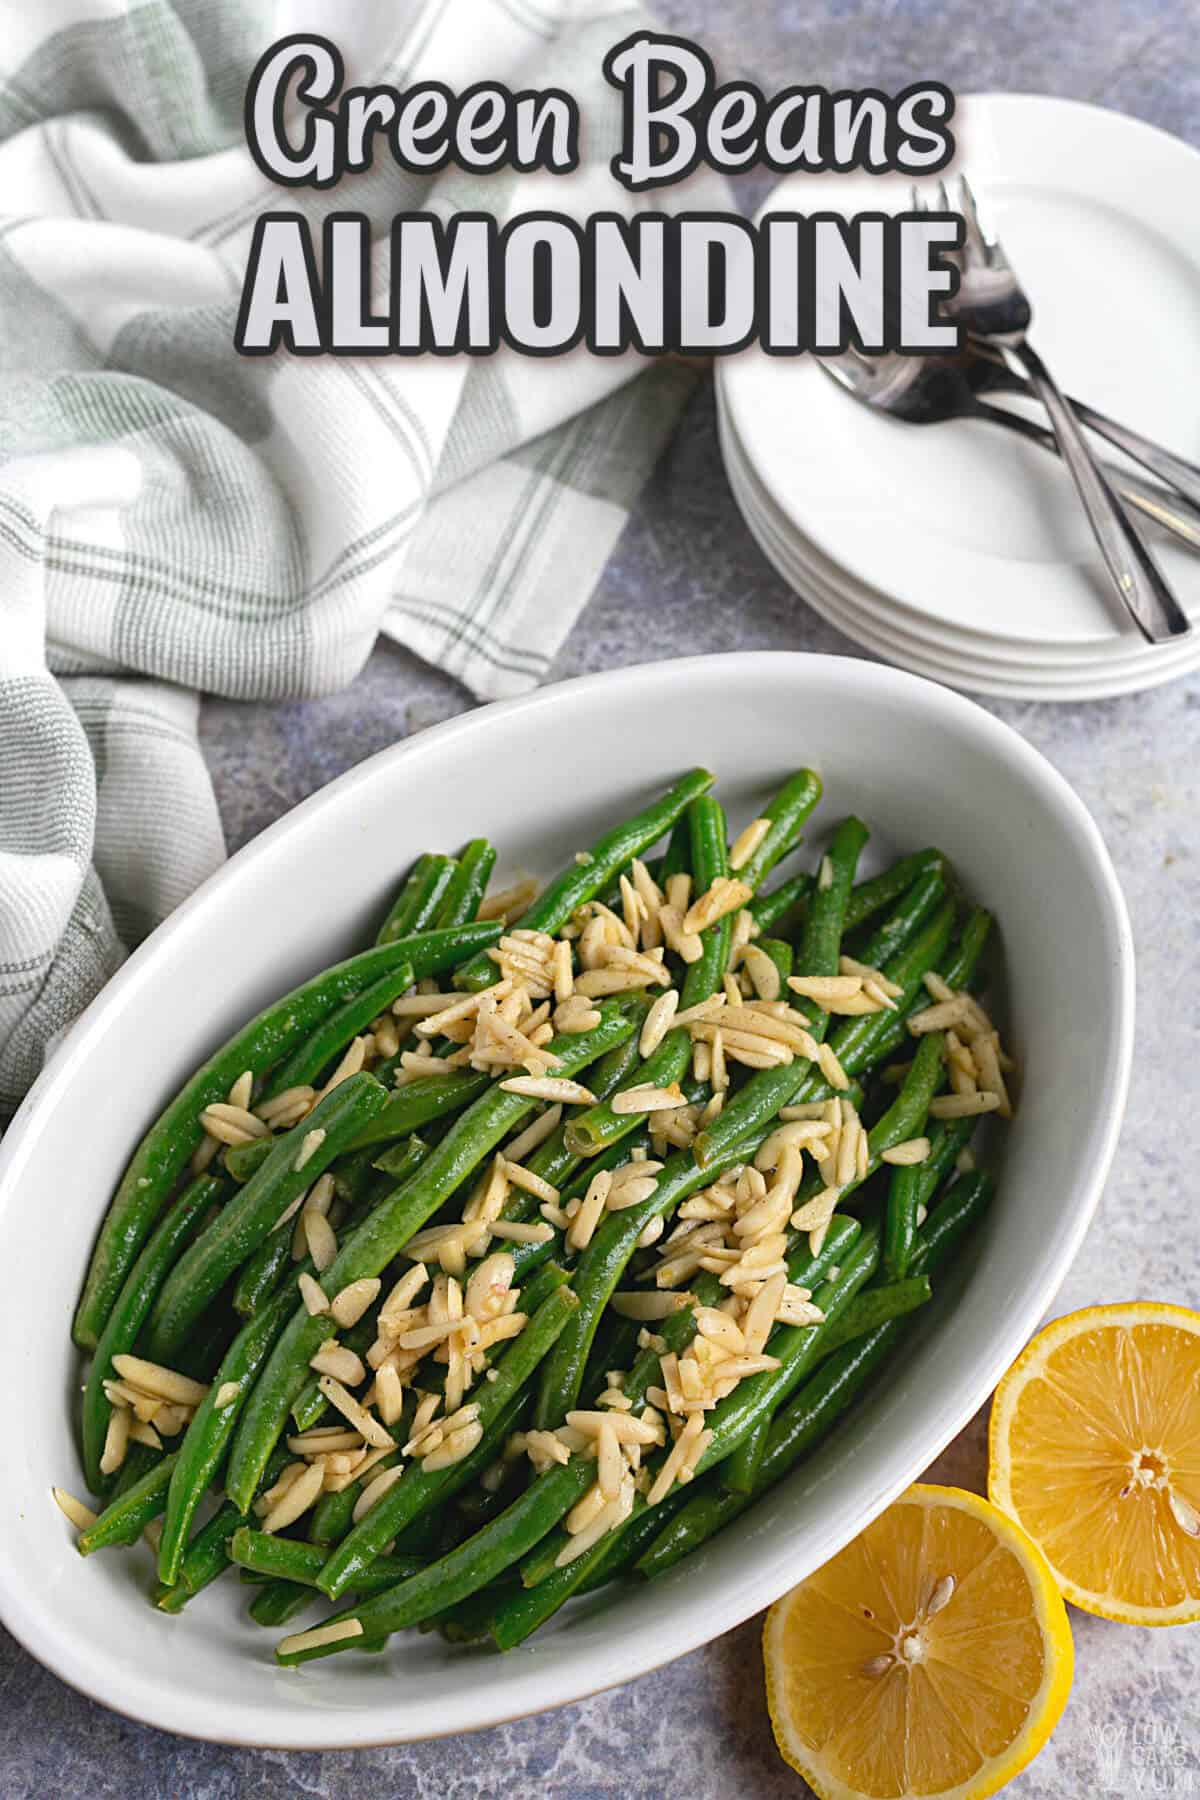 green beans almondine recipe cover image